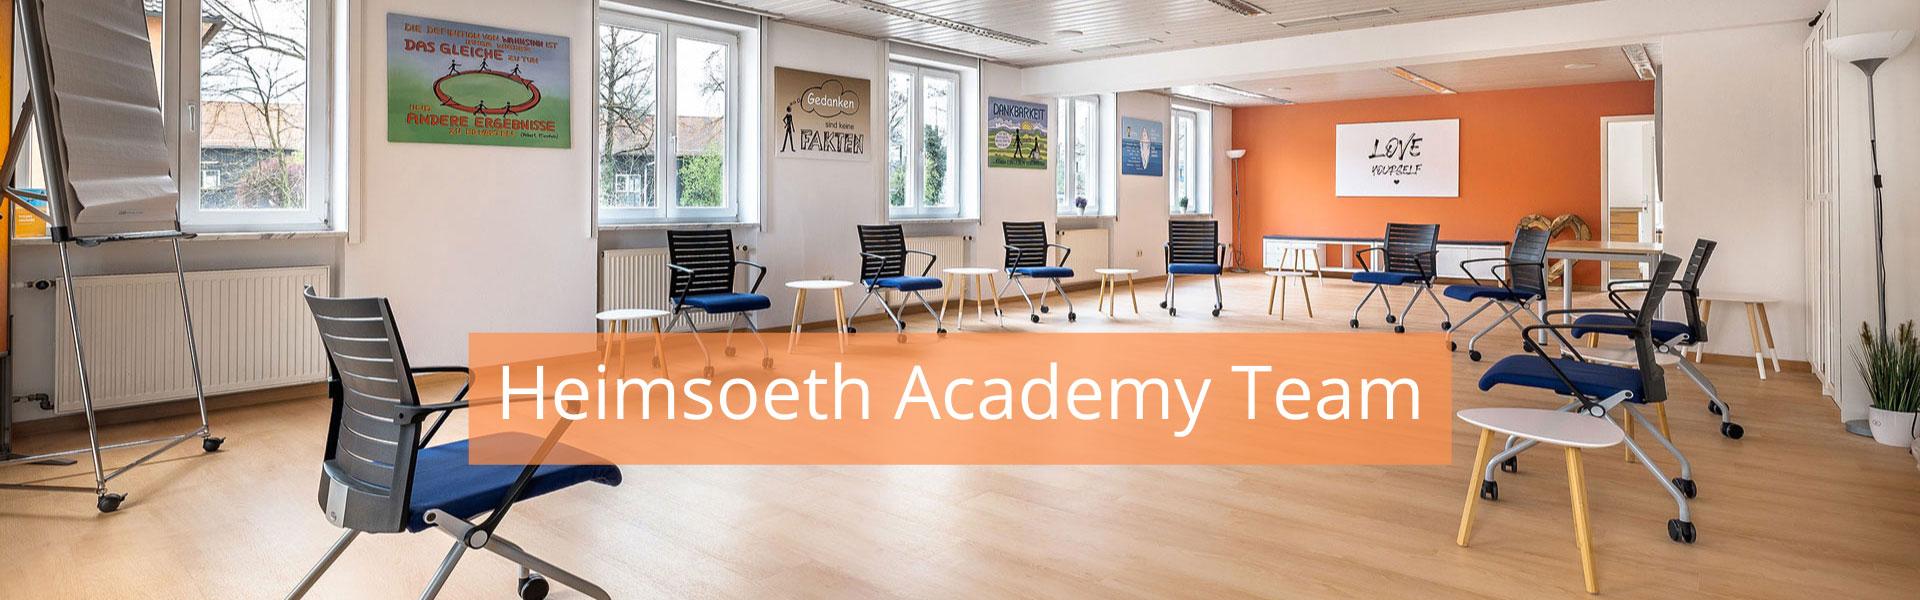 Heimsoeth Academy – Das Team